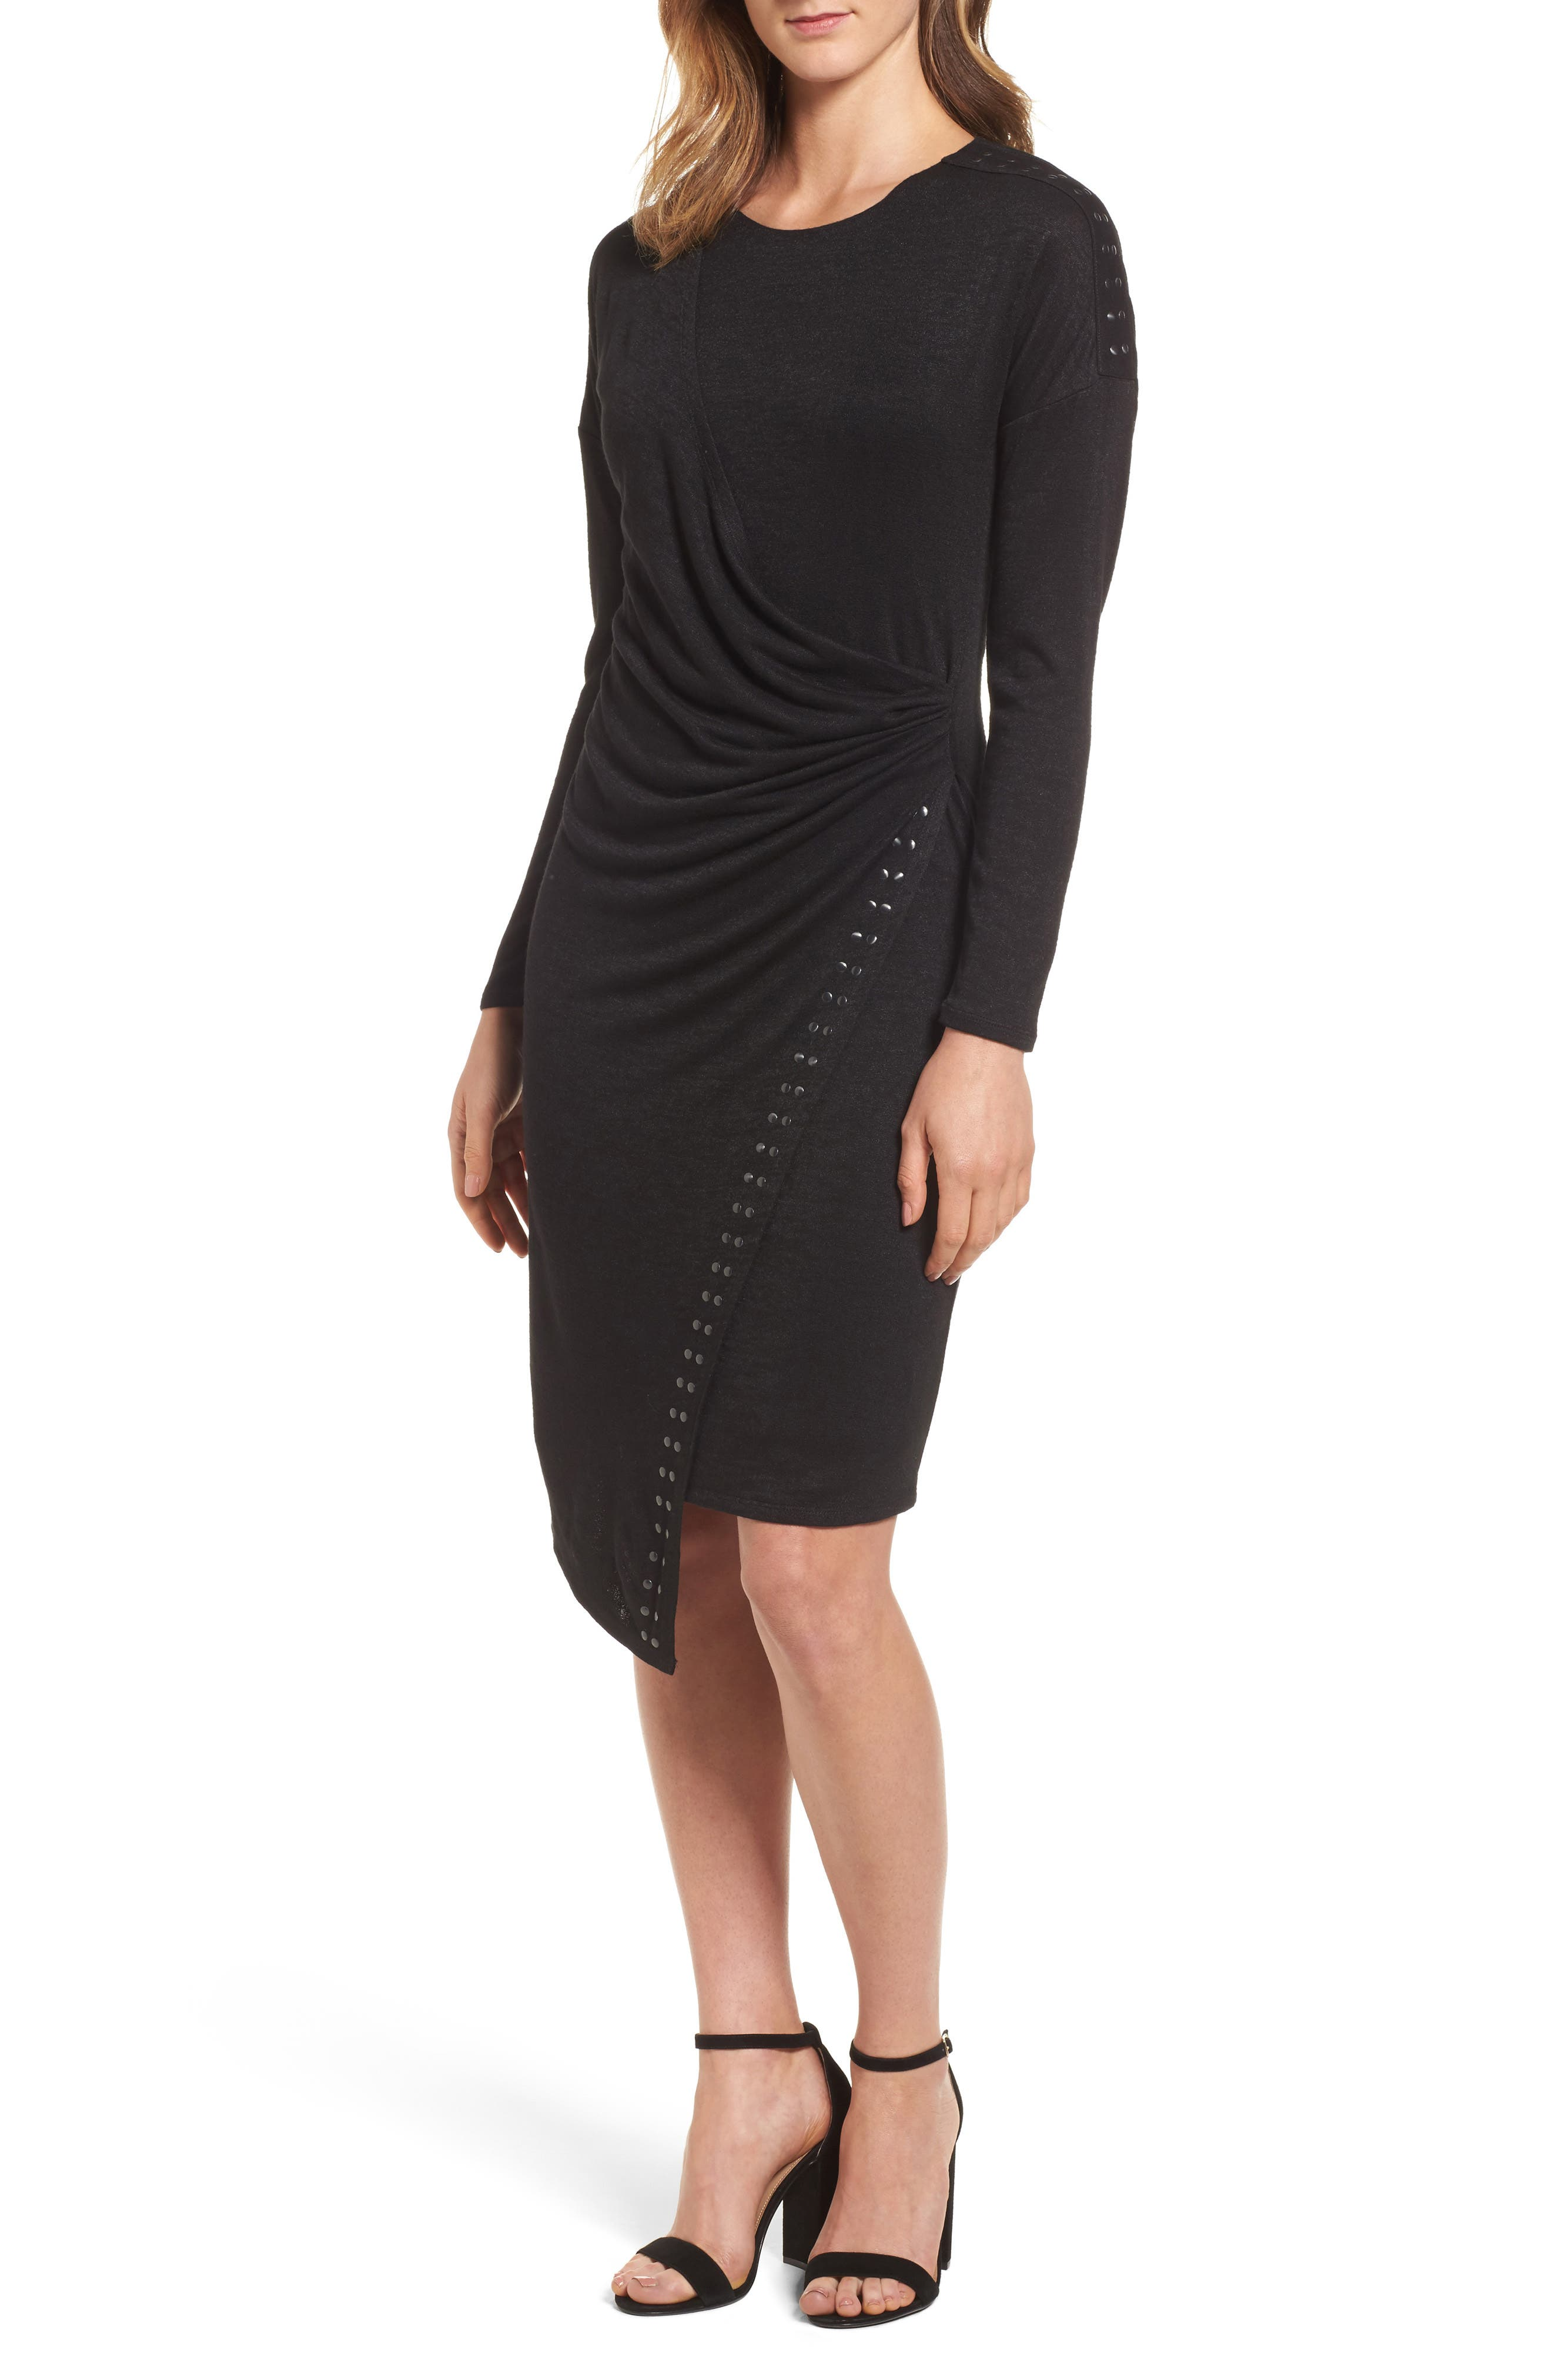 Main Image - NIC+ZOE Studded Every Occasion Dress (Regular & Petite)